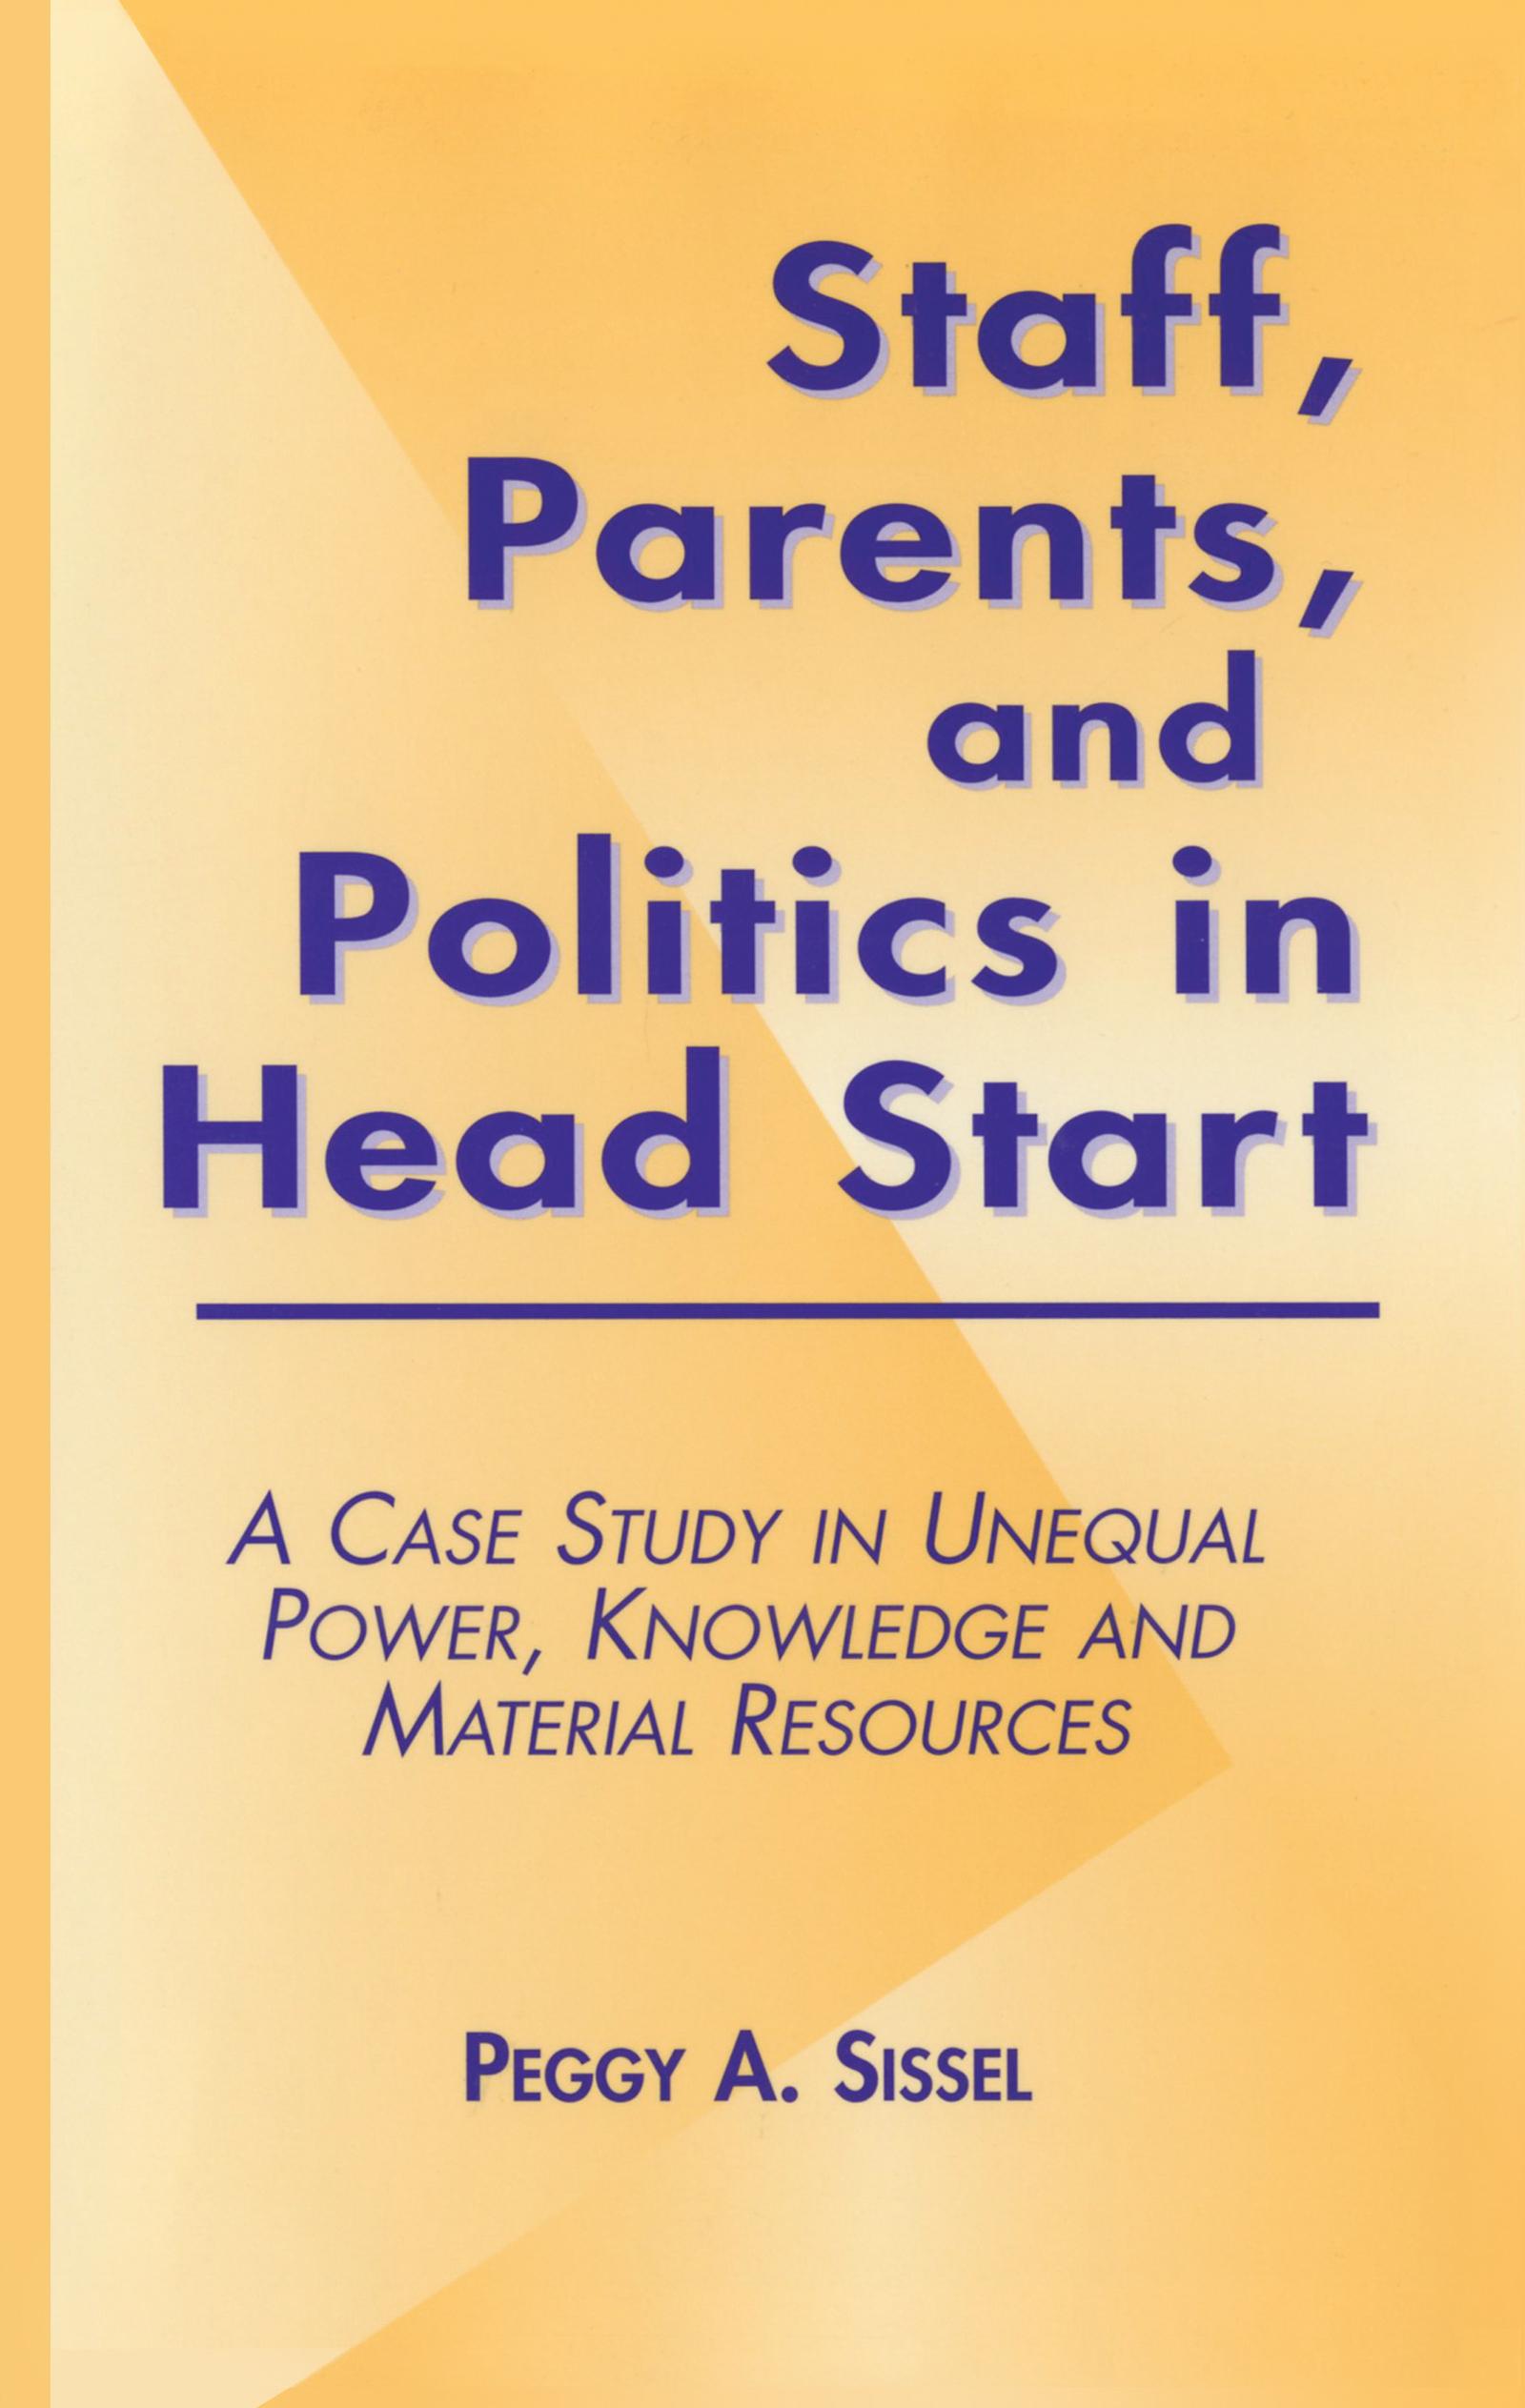 Staff, Parents and Politics in Head Start